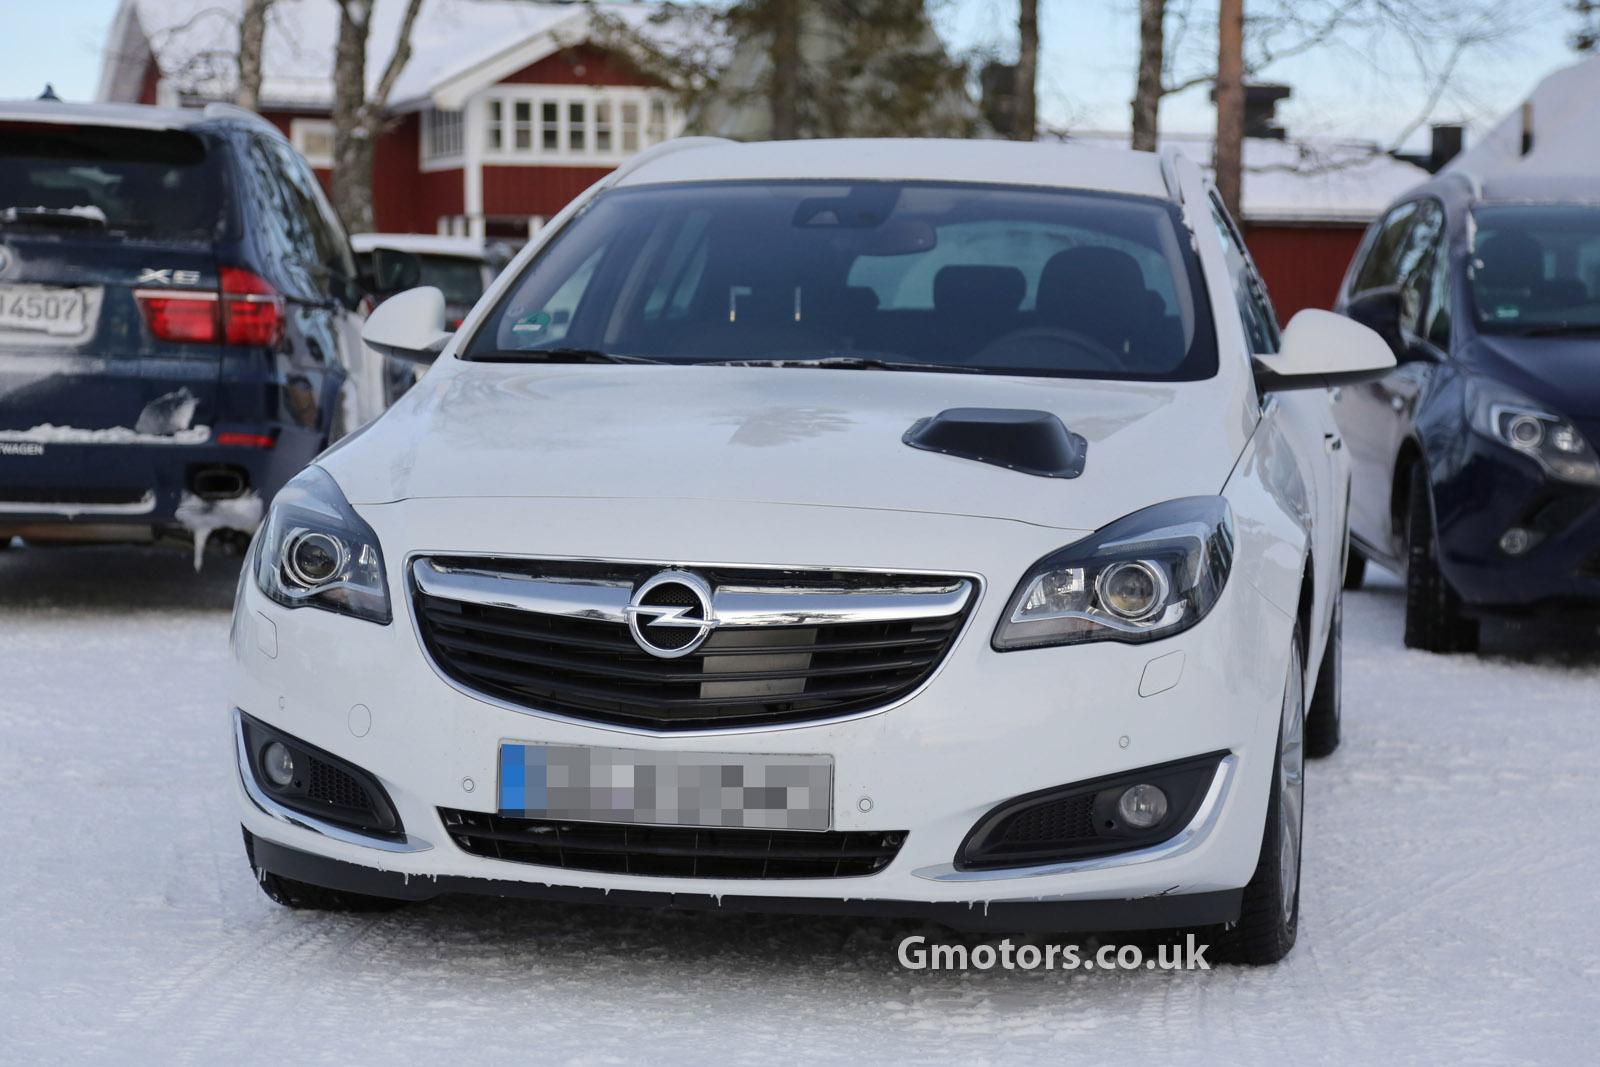 2017 - [Opel] Insignia Grand Sport [E2JO] 2016-Vauxhall-Opel-Insignia-mule-8